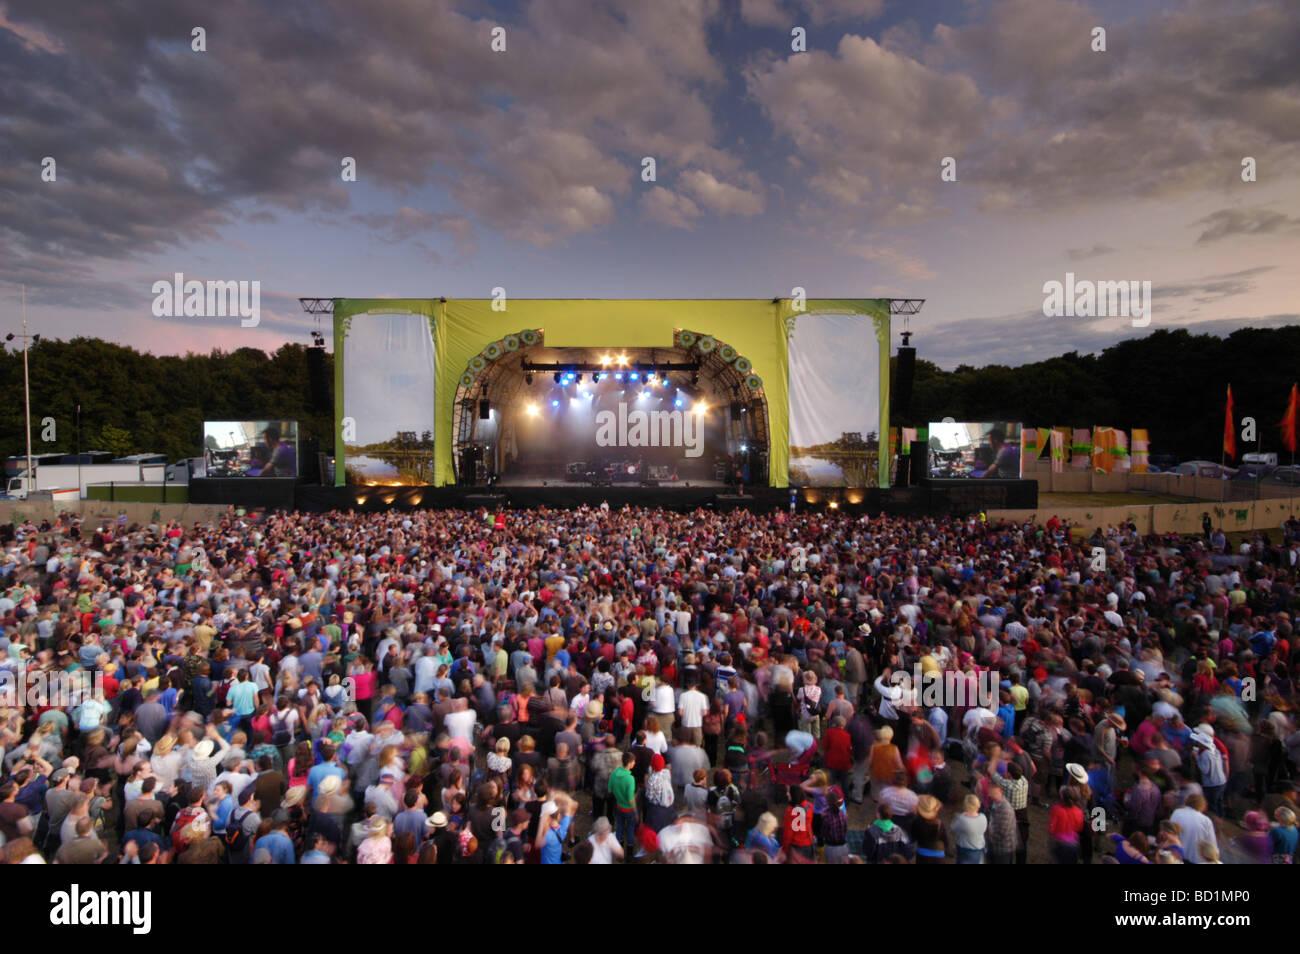 Latitud Music Festival Escenario Principal, en Southwold, Suffolk, Reino Unido Imagen De Stock